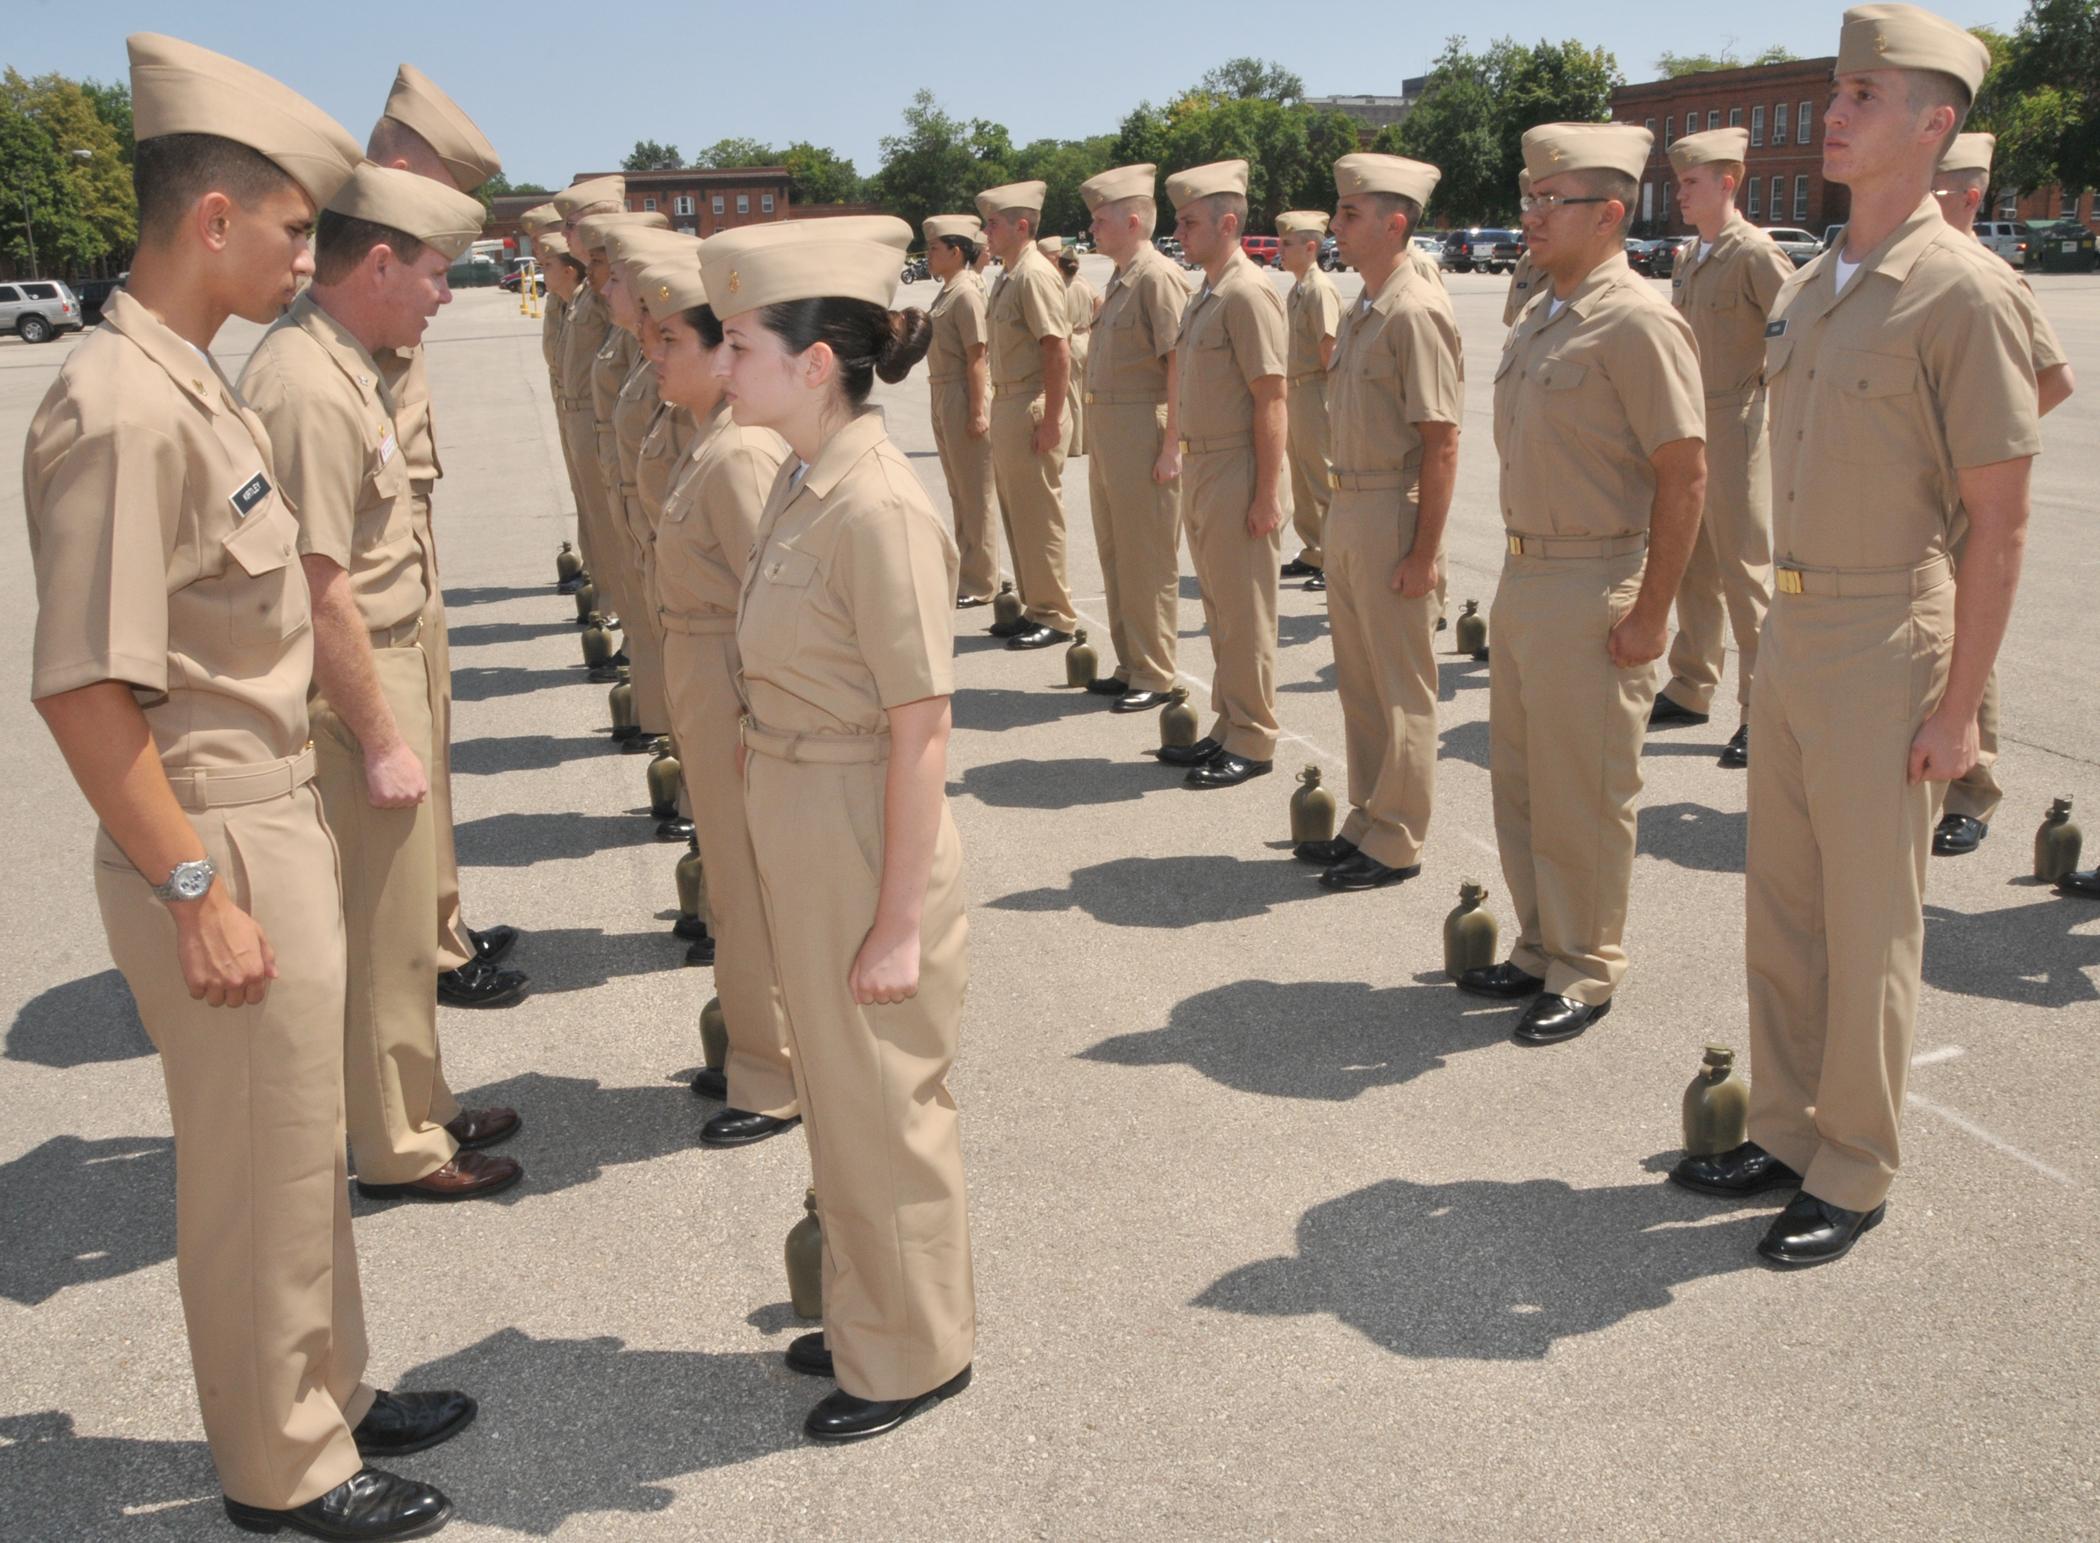 Hotels Near Navy Base In Chicago